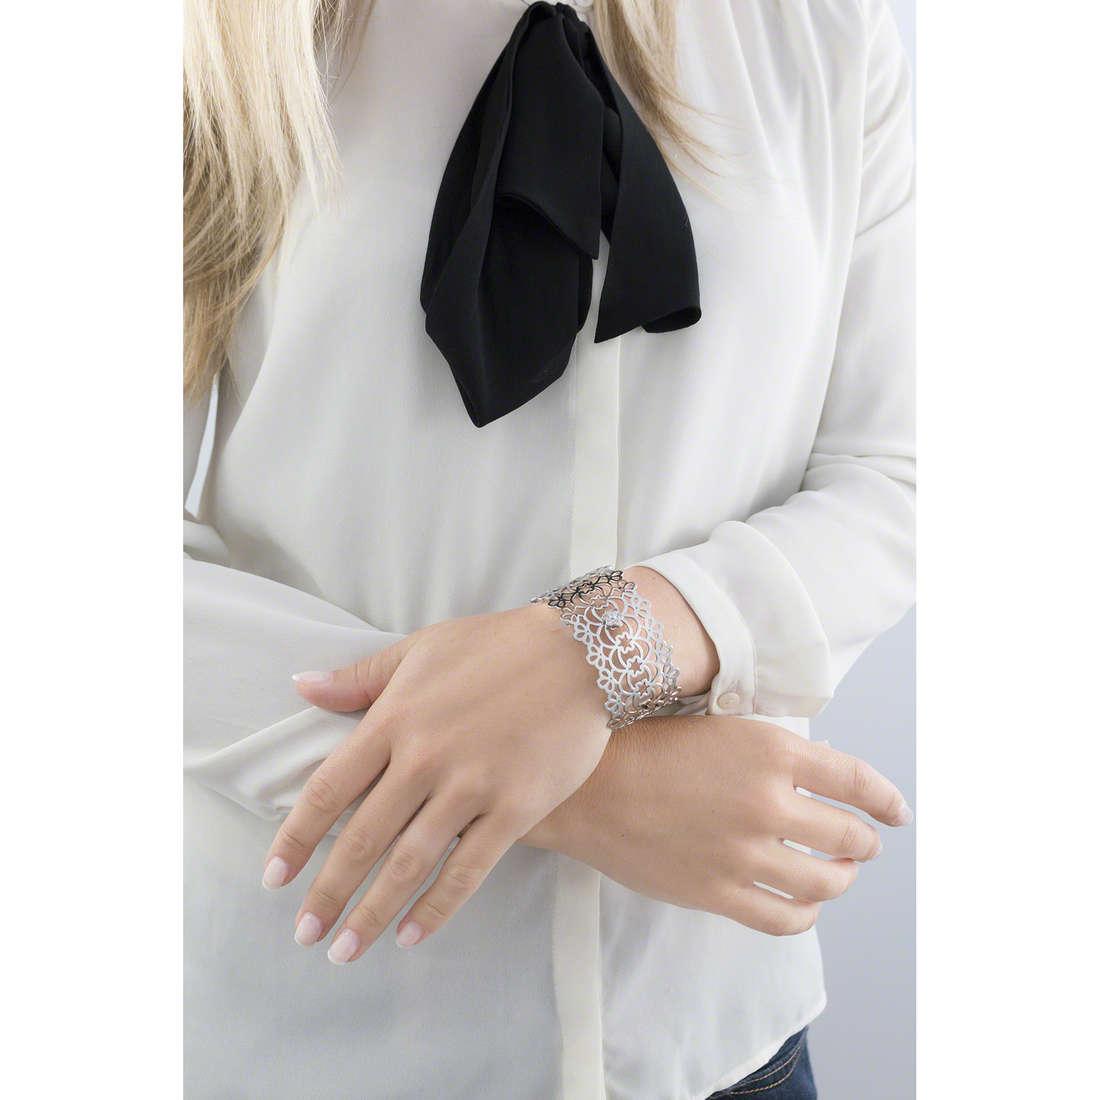 Morellato bracciali Kaleido donna SADY11 indosso